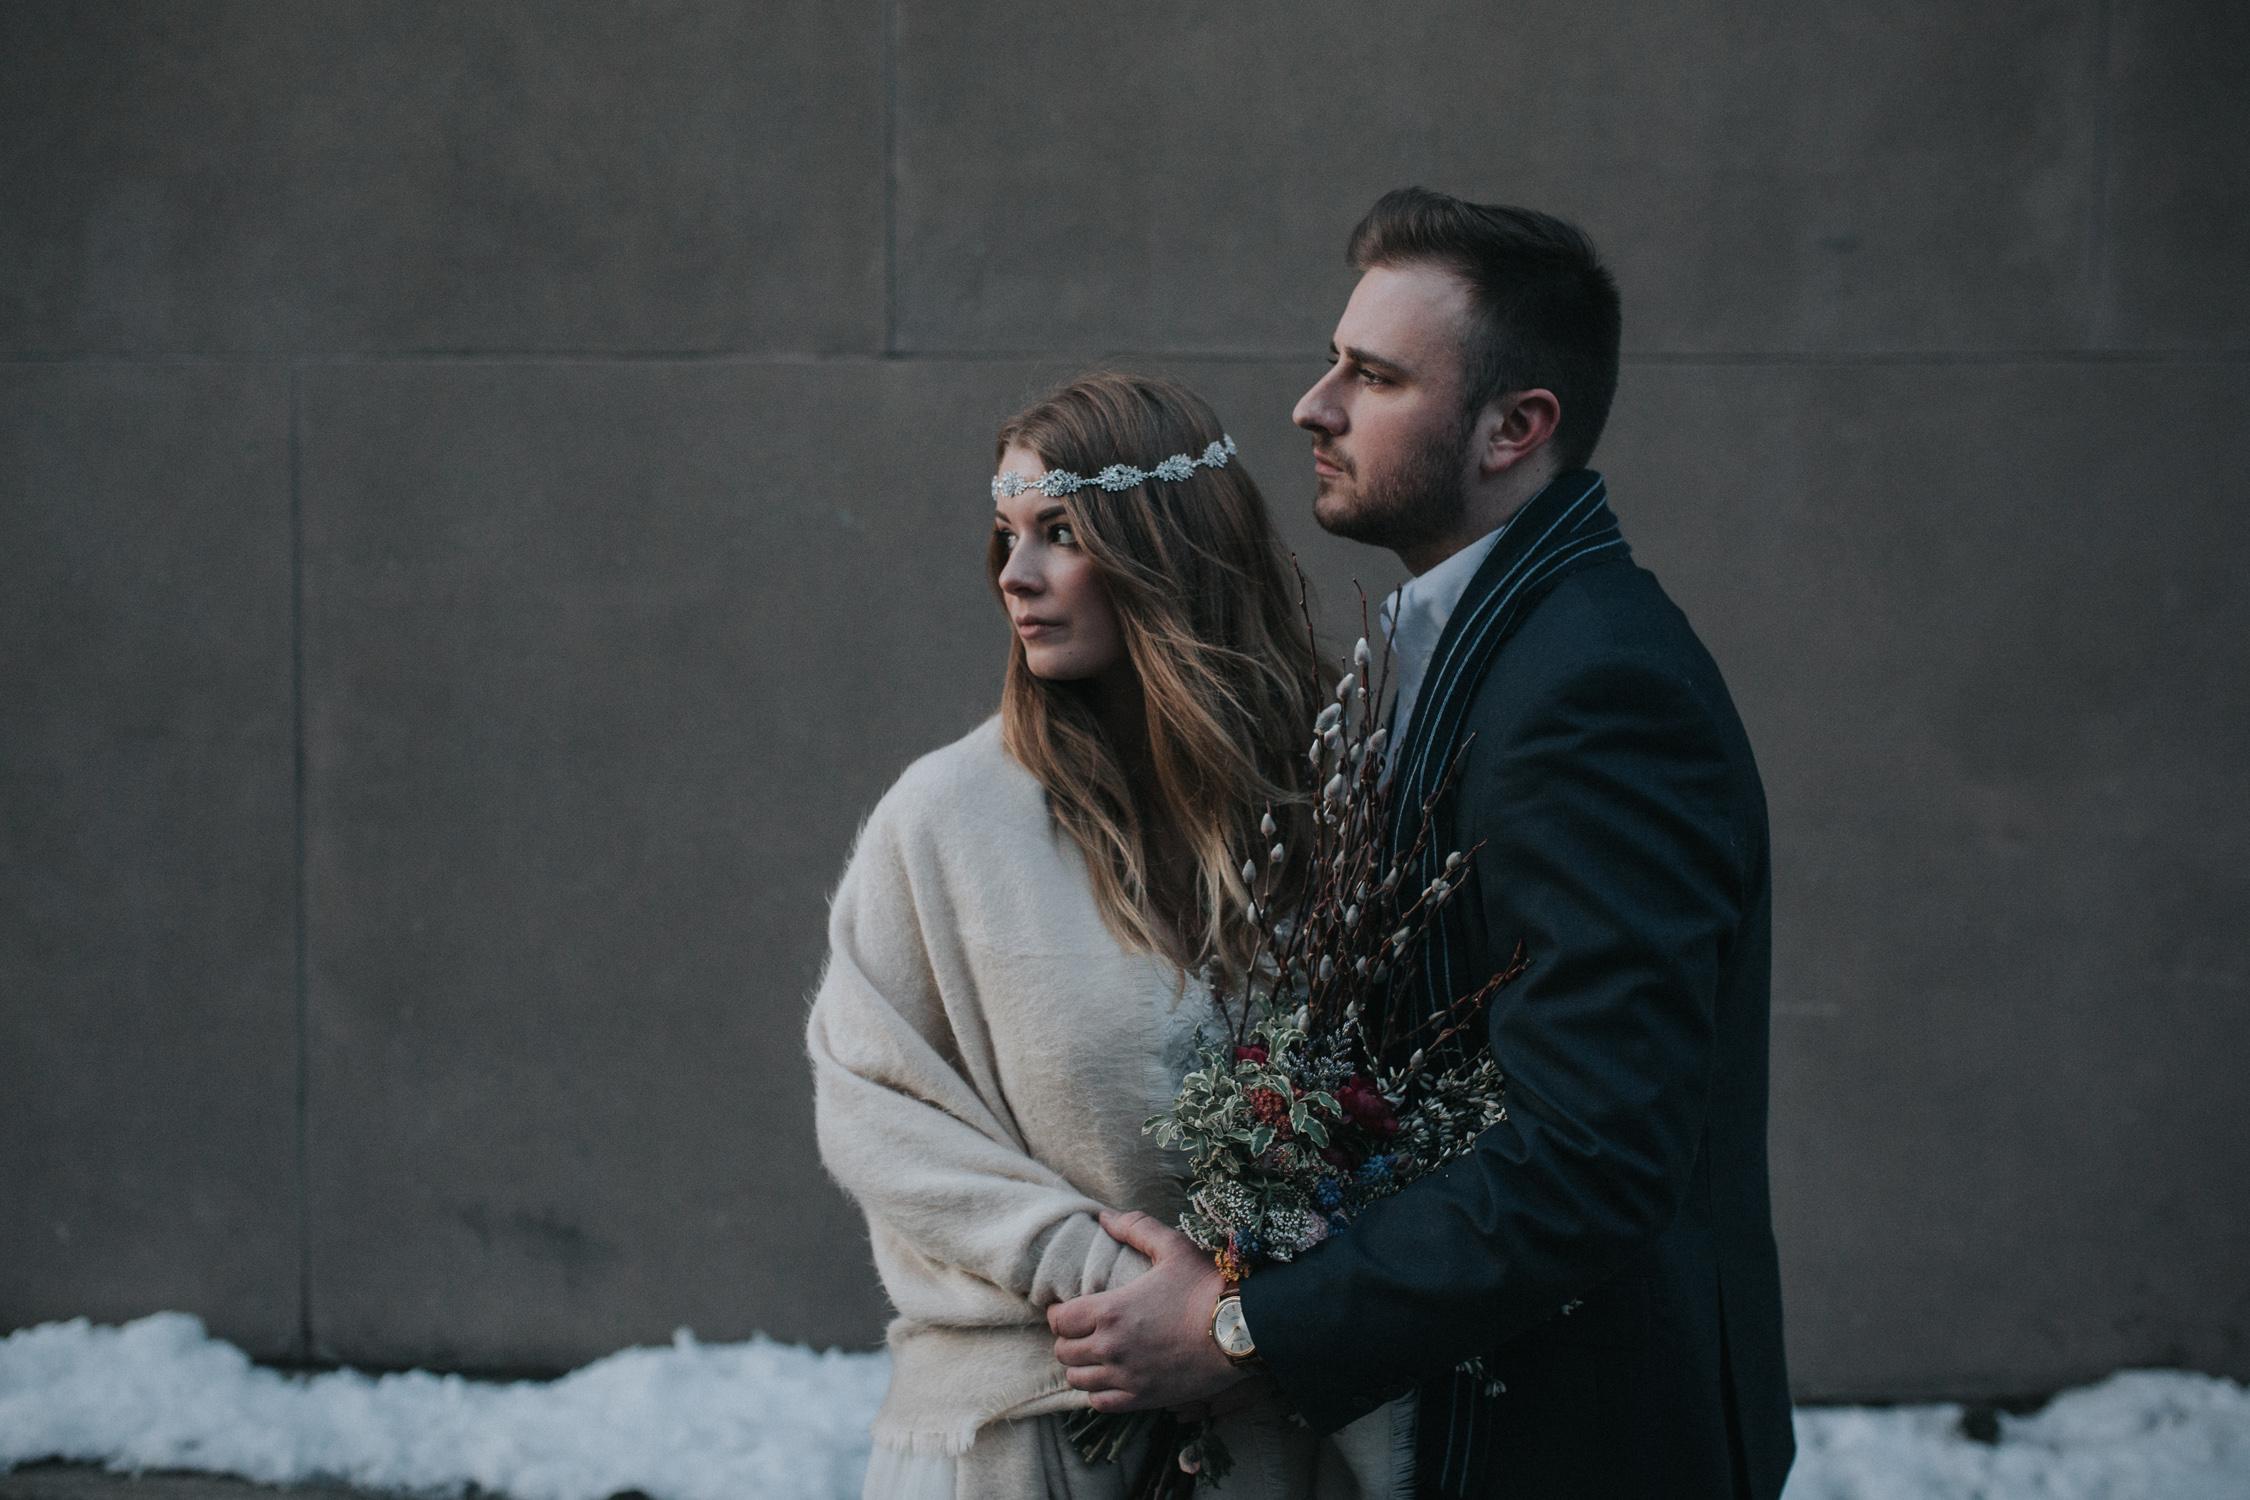 troy_new_york_wedding_038.JPG